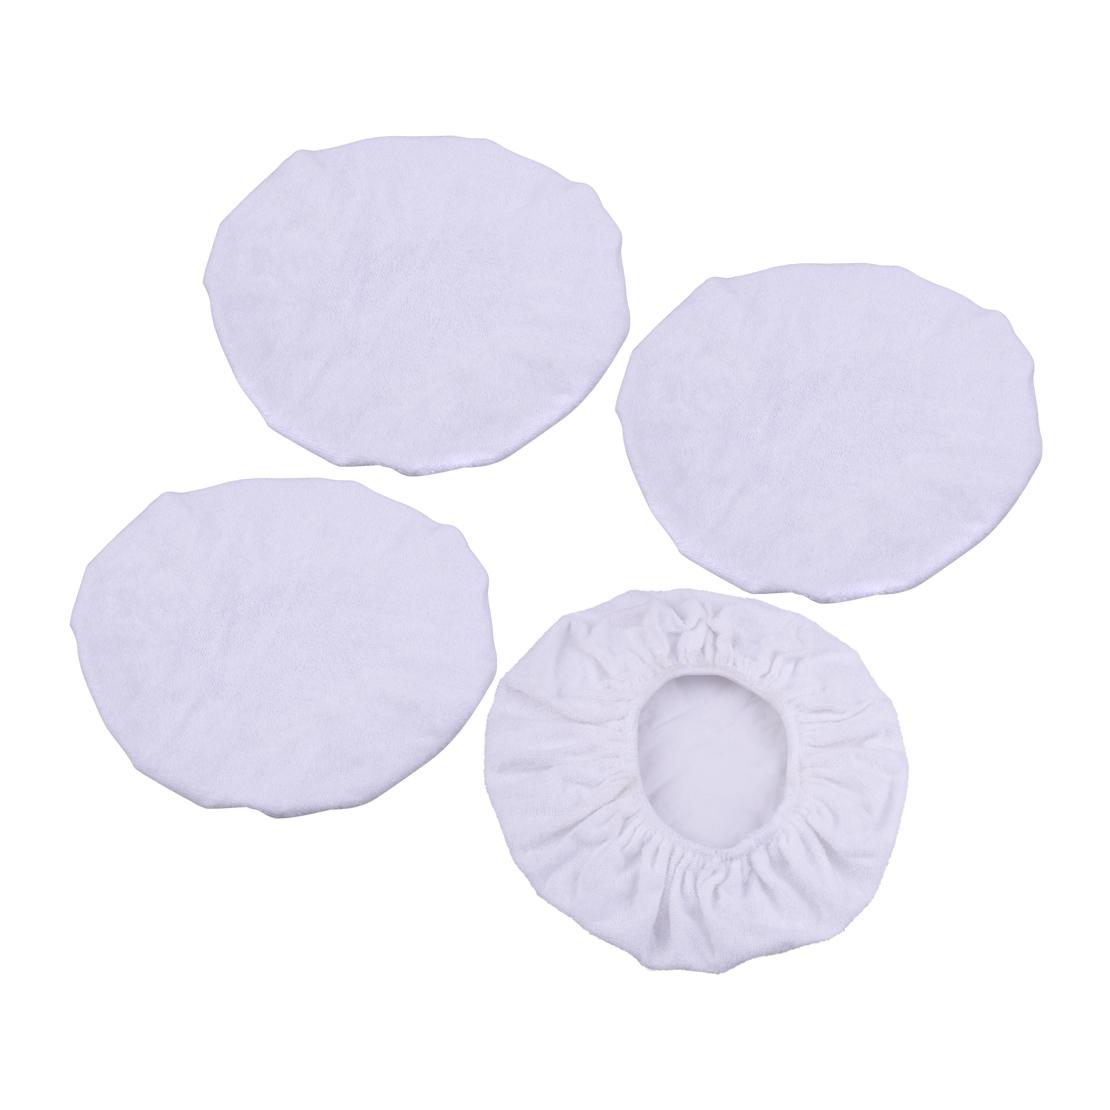 4X Car Soft Wool Sponge Cover Polishing Bonnet Buffer Pad For 9/&10/'/' Polisher